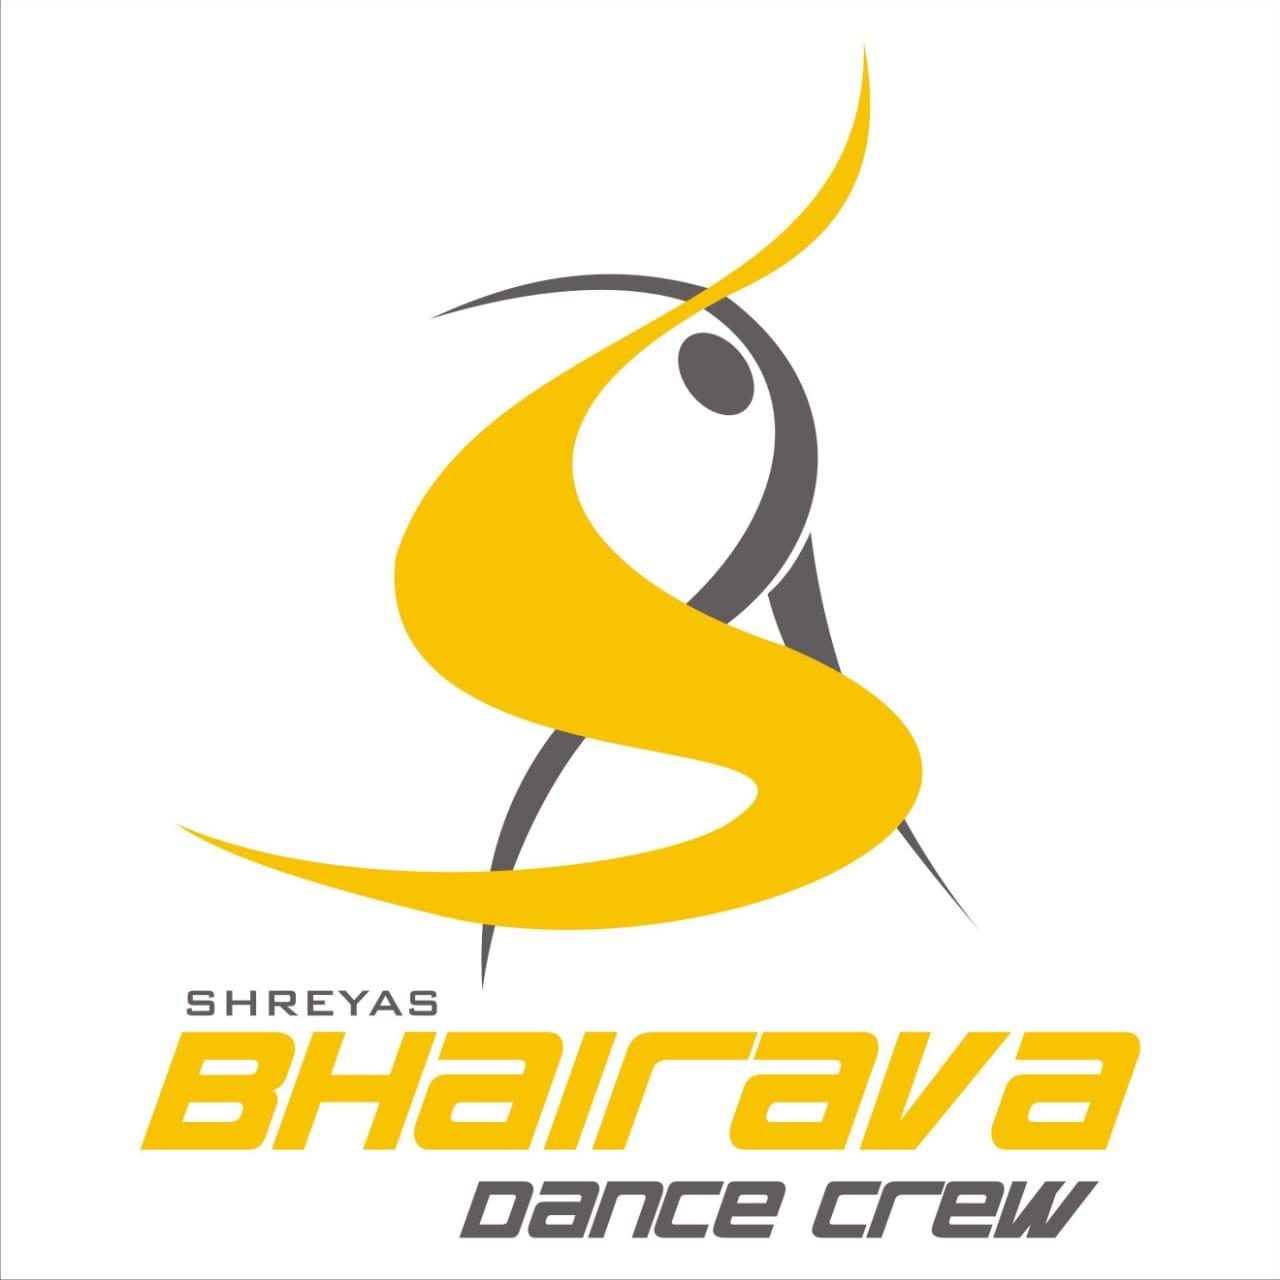 Shreyas Bhairava Dance Crew HMT Layout